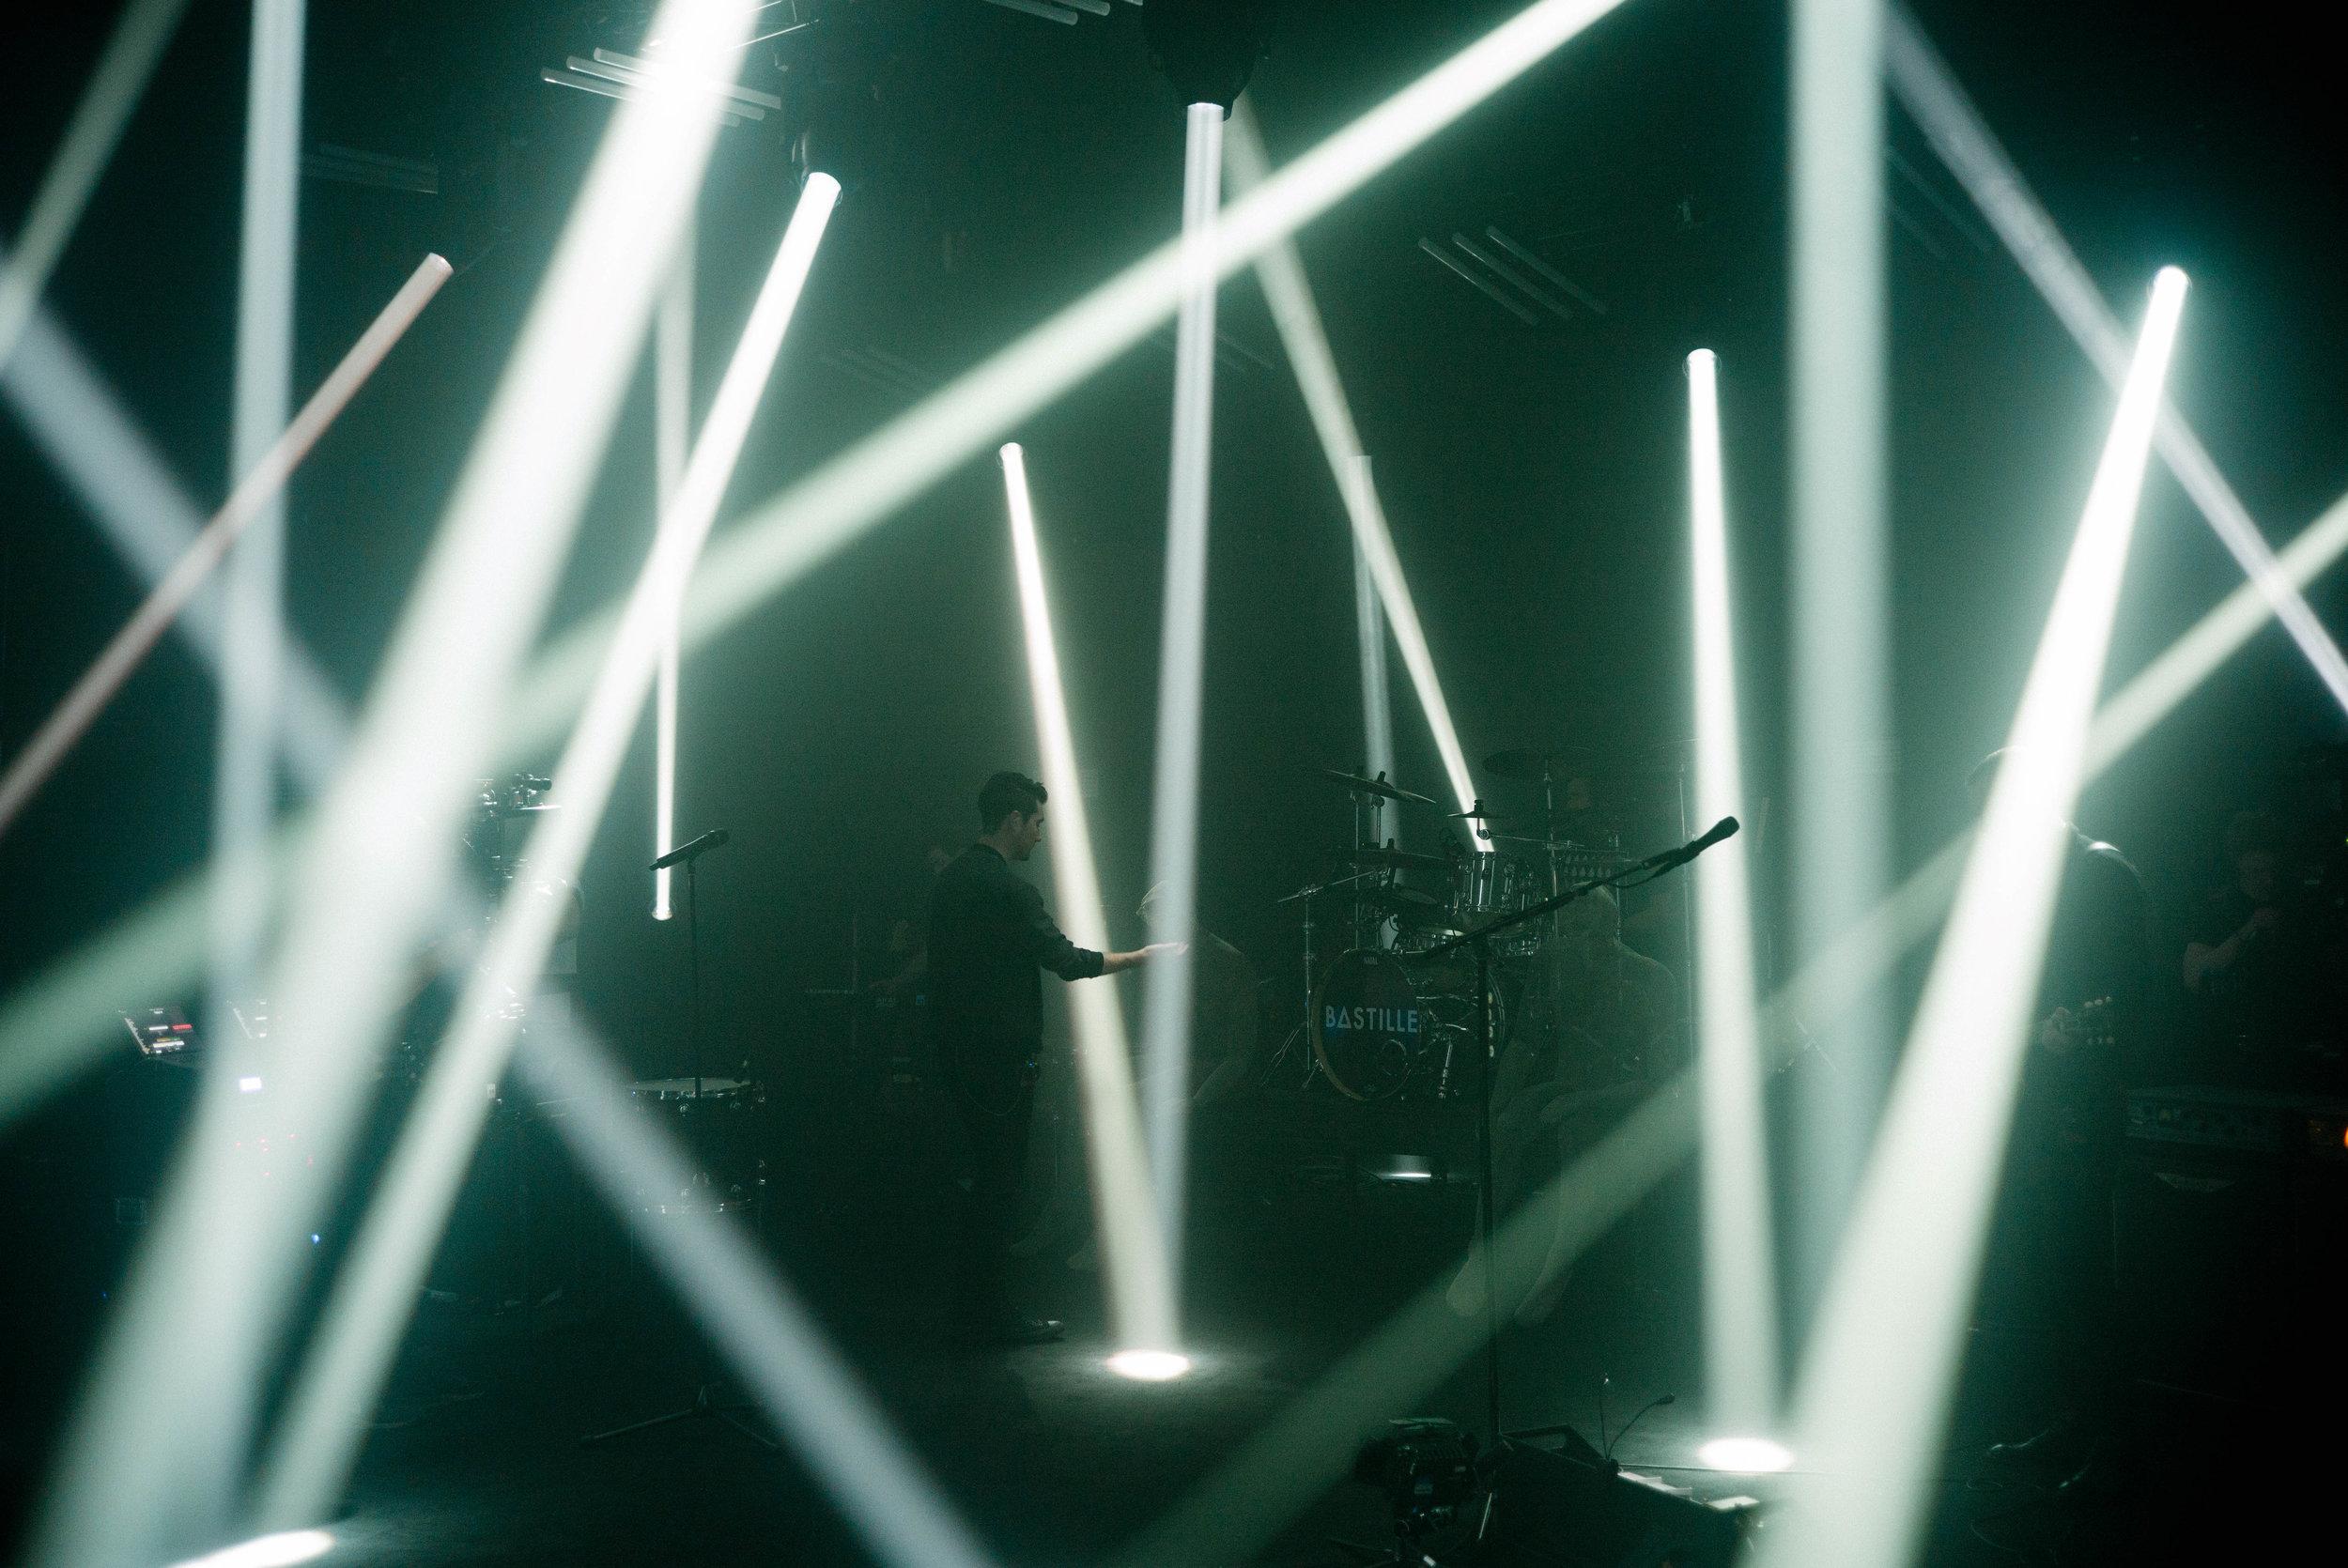 Bastille, Vevo shoot, London 2016